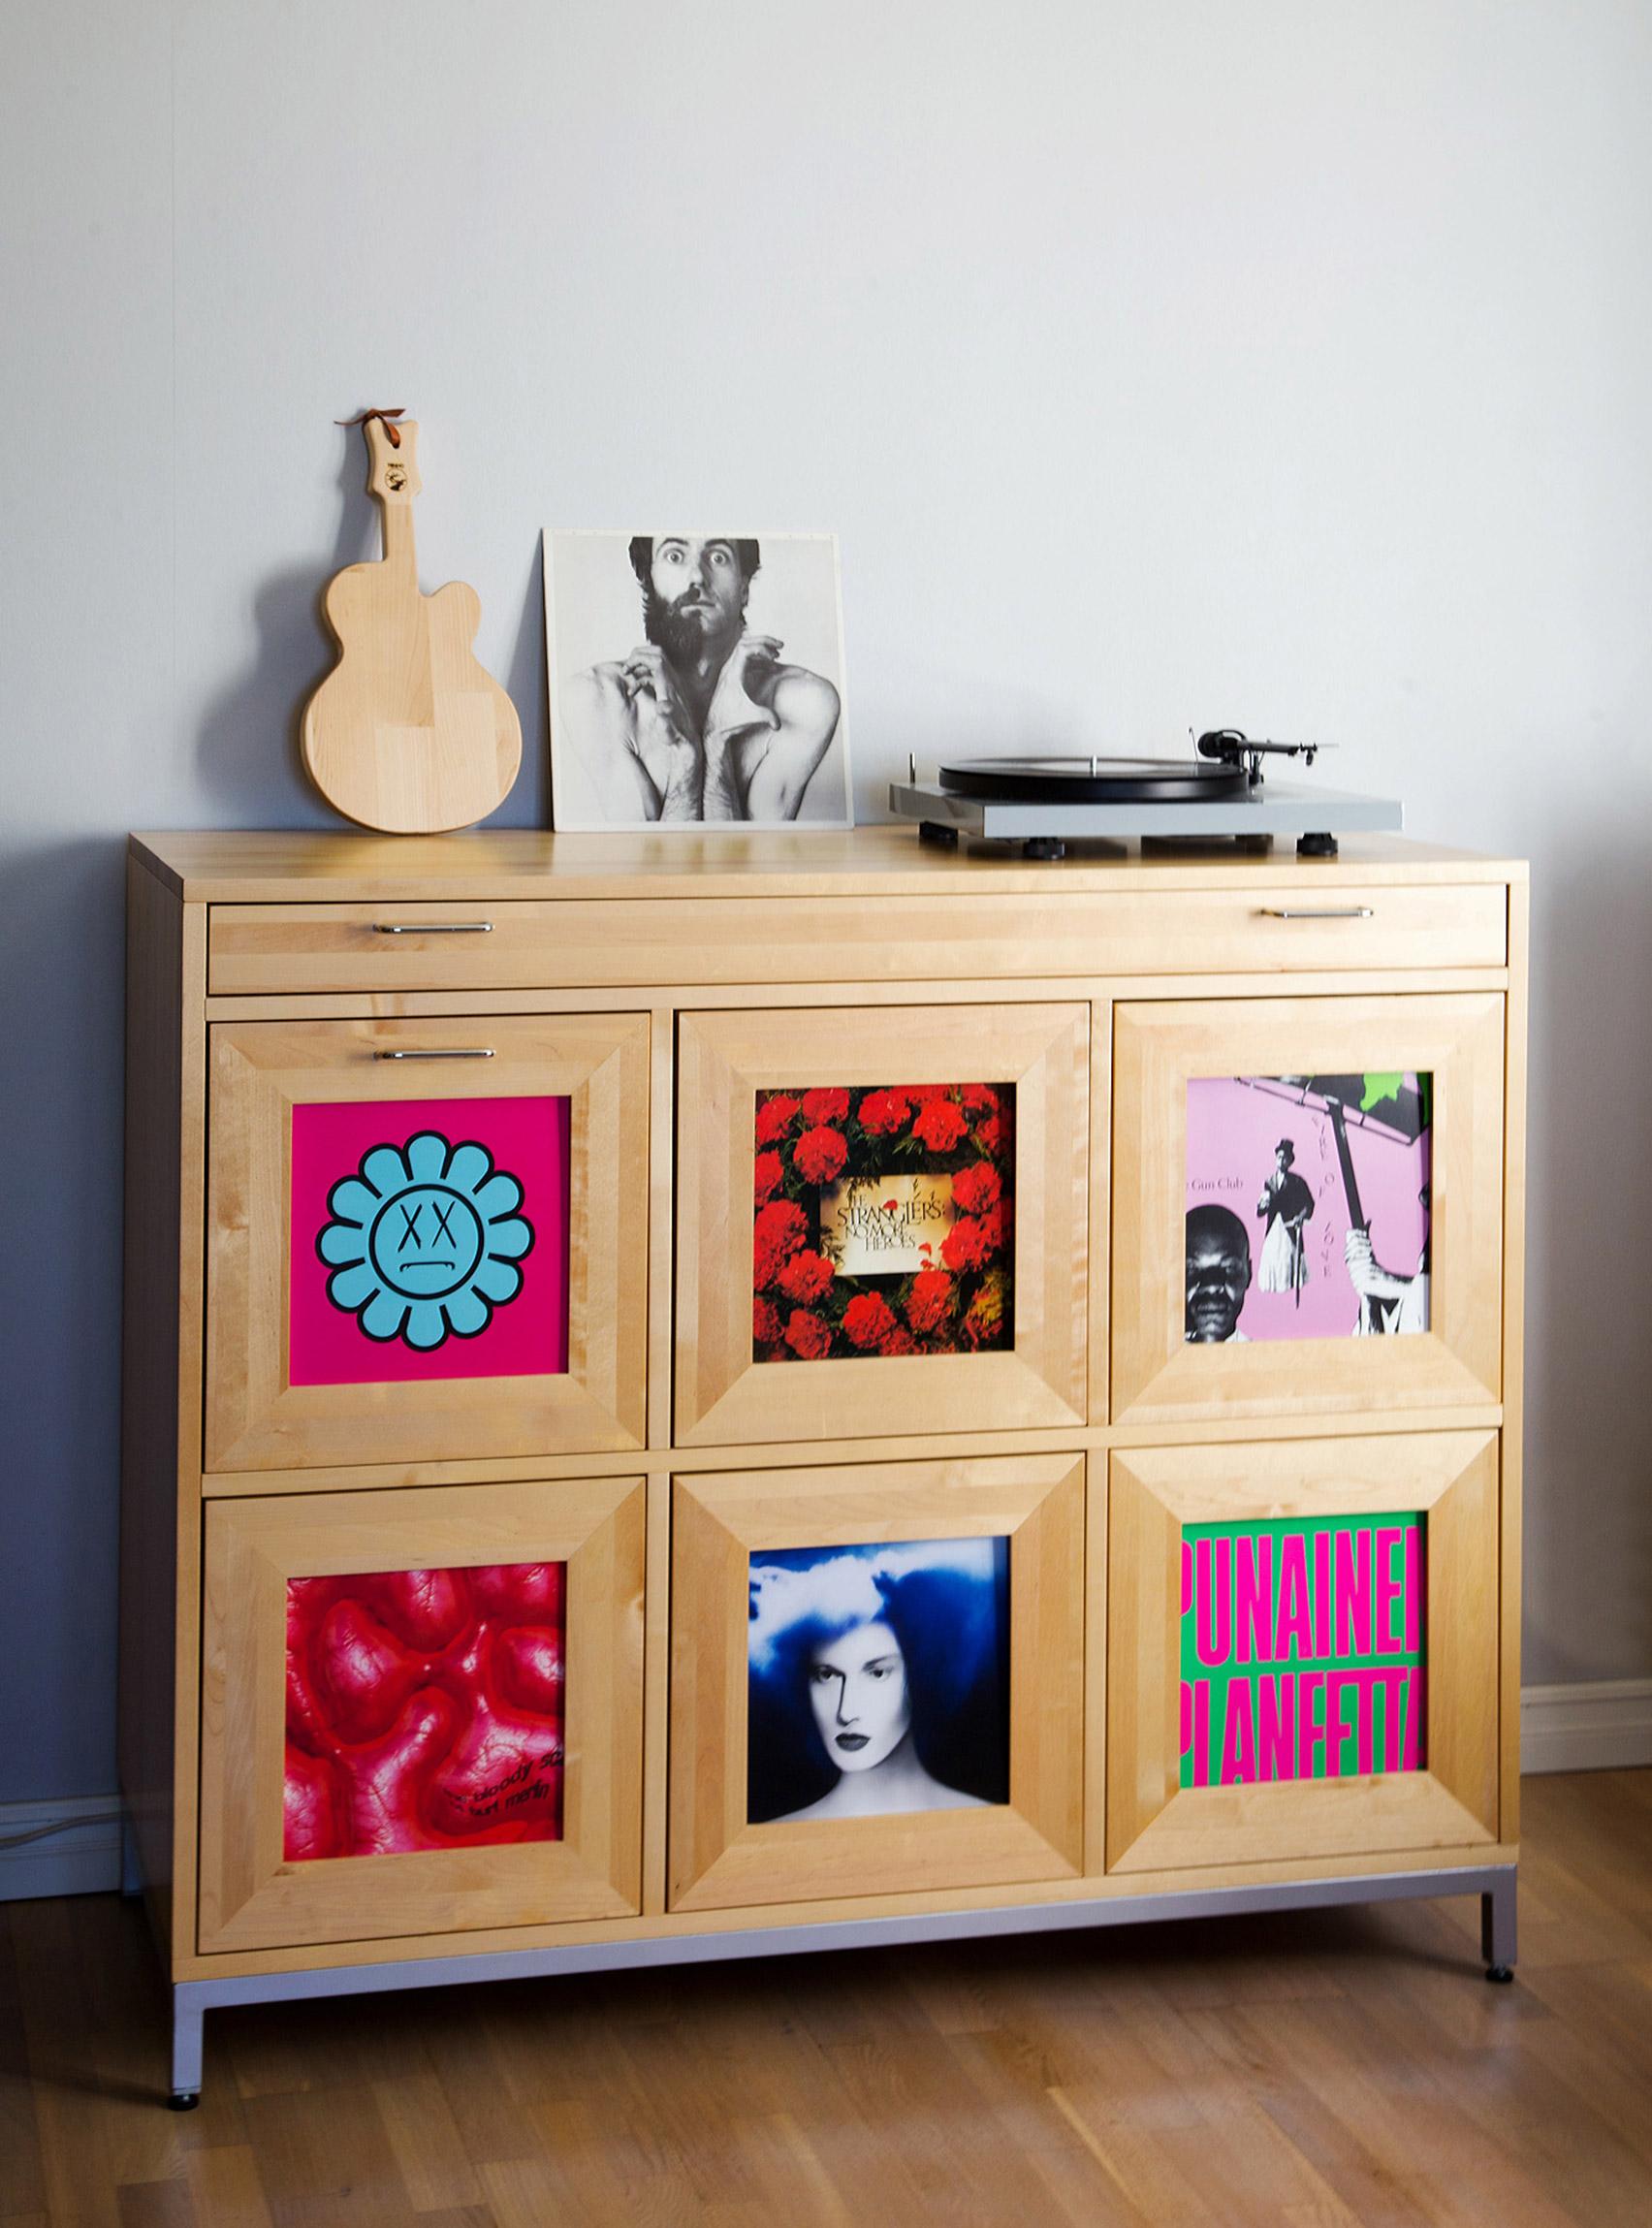 Saana vinyl record cabinet by Tenho Design